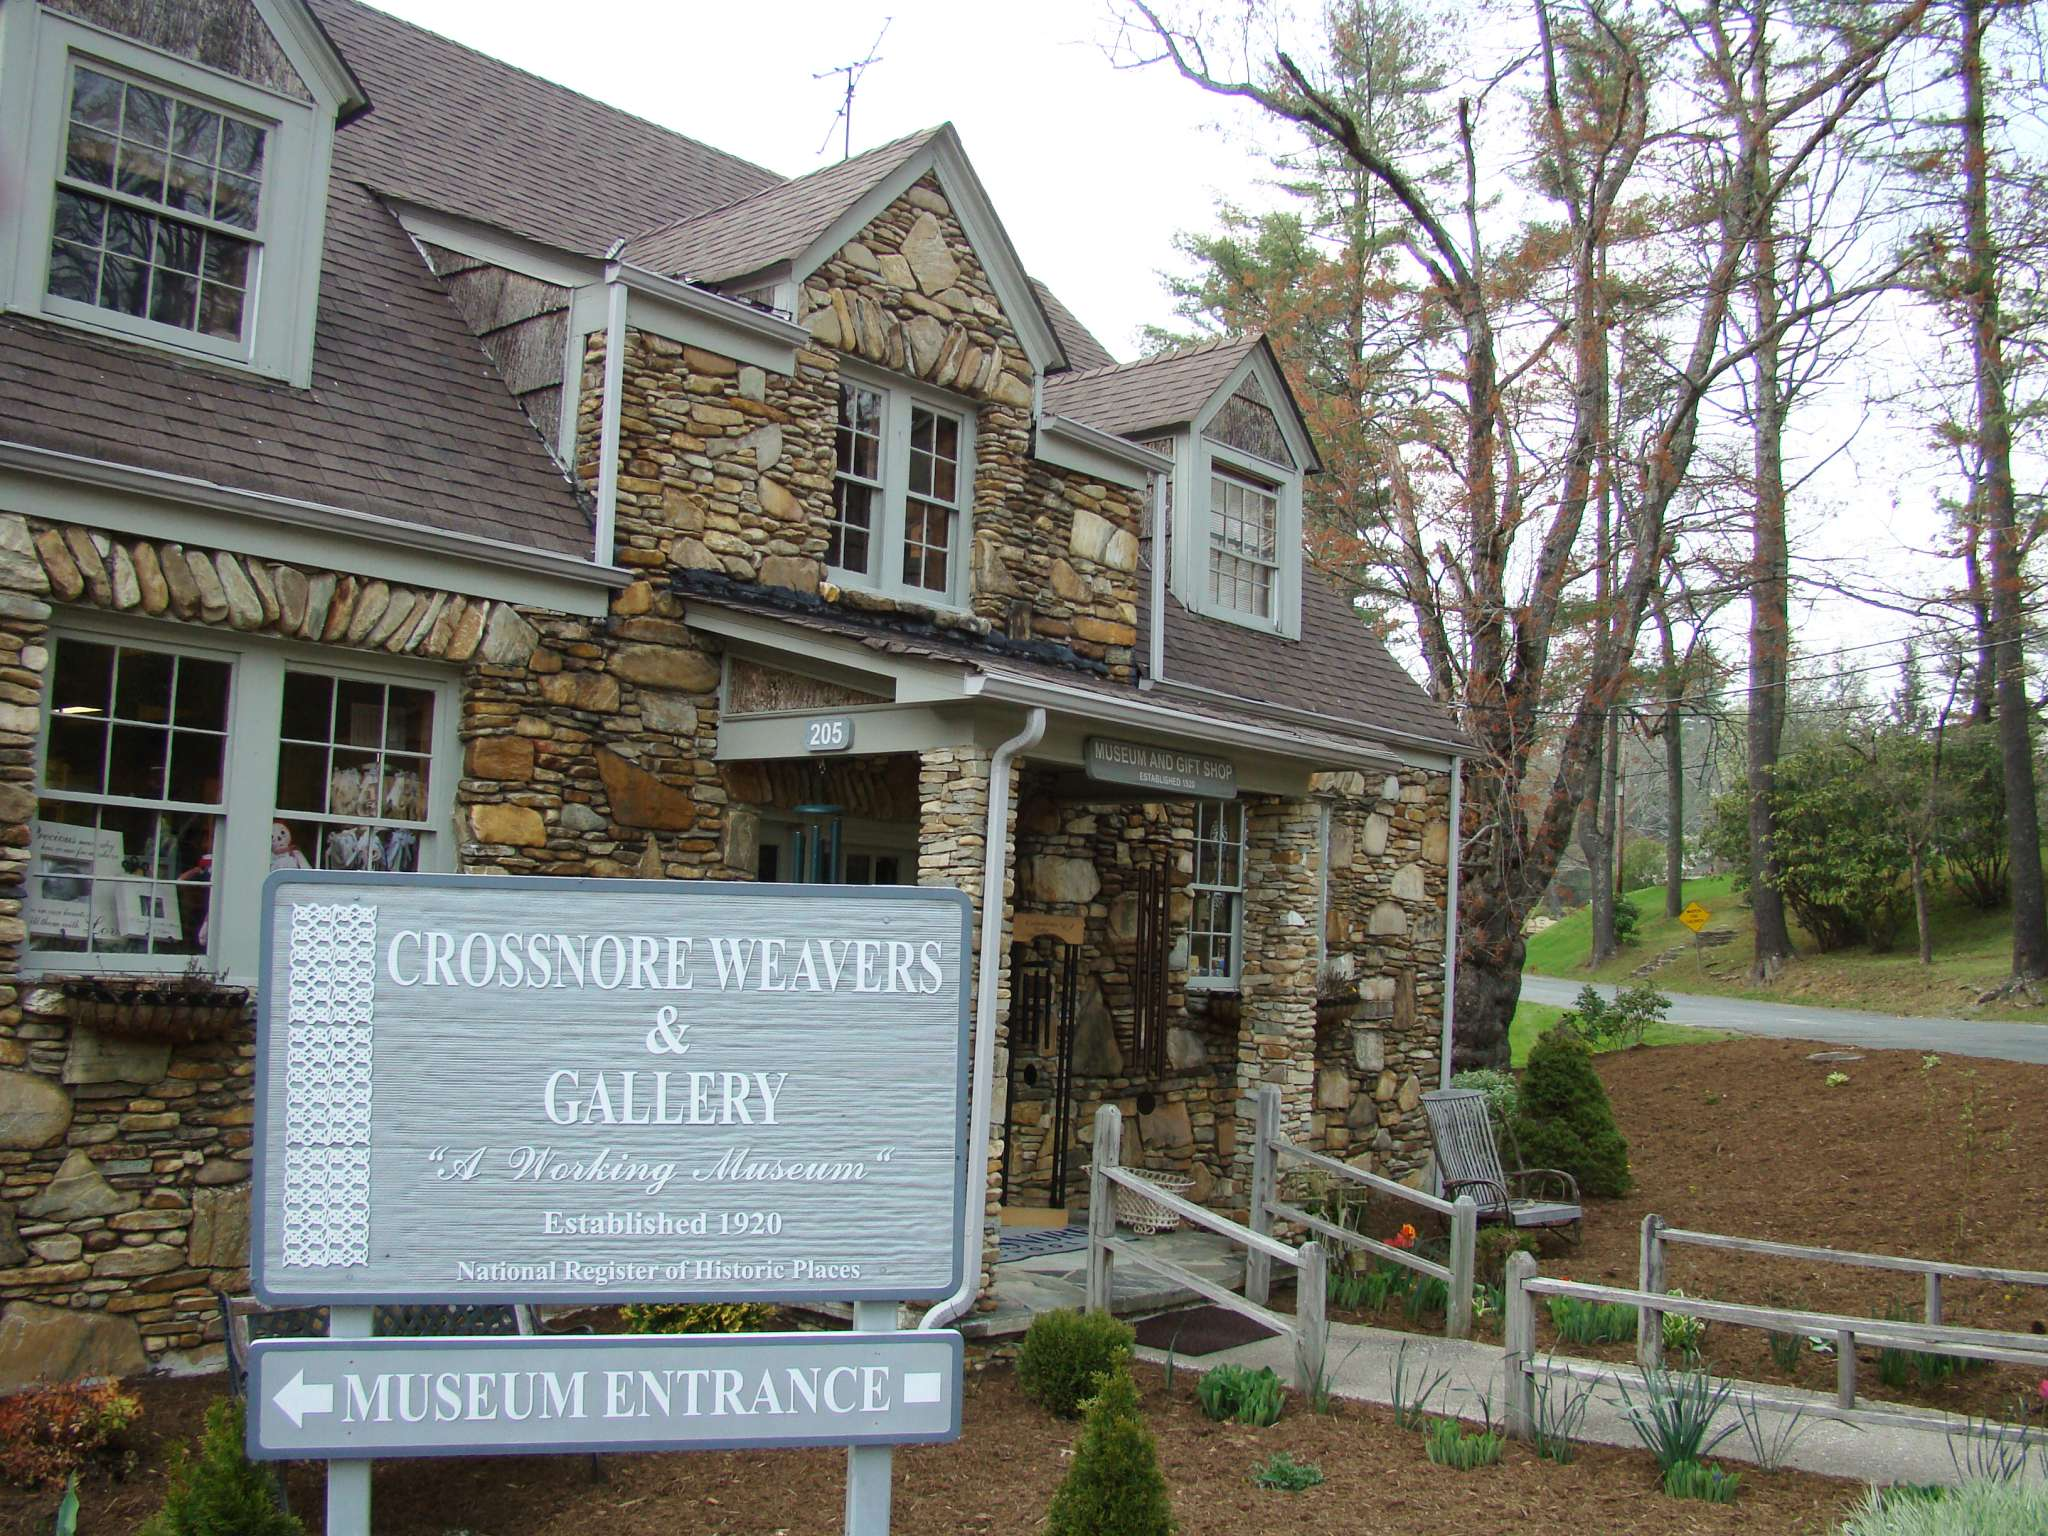 Crossnore Weavers Gallery & Museum